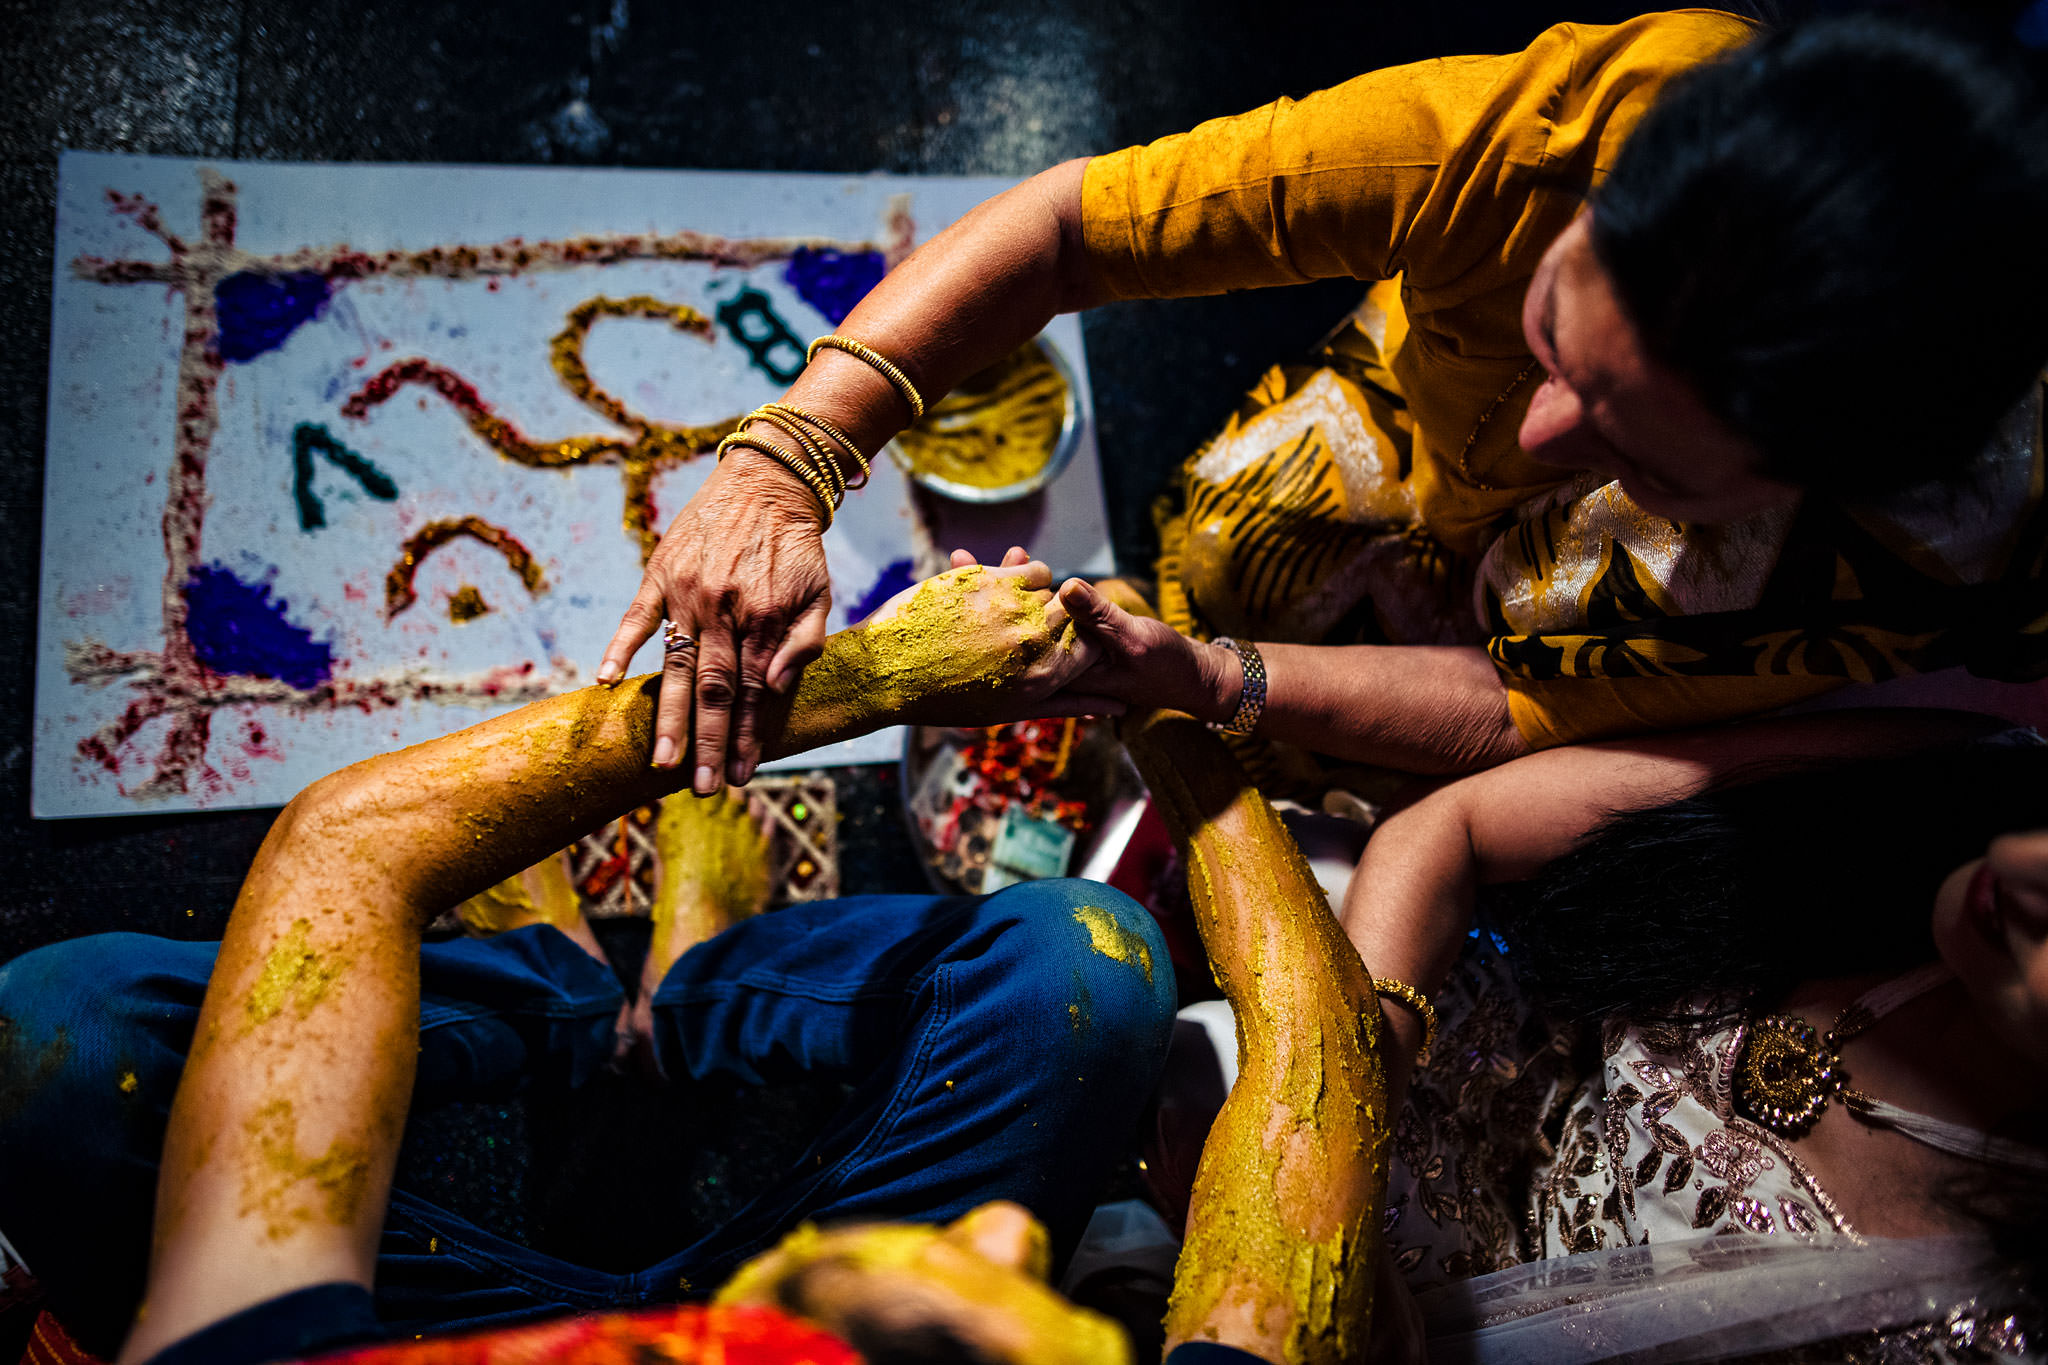 Haldi turmeric ceremony - photo by Rich Howman